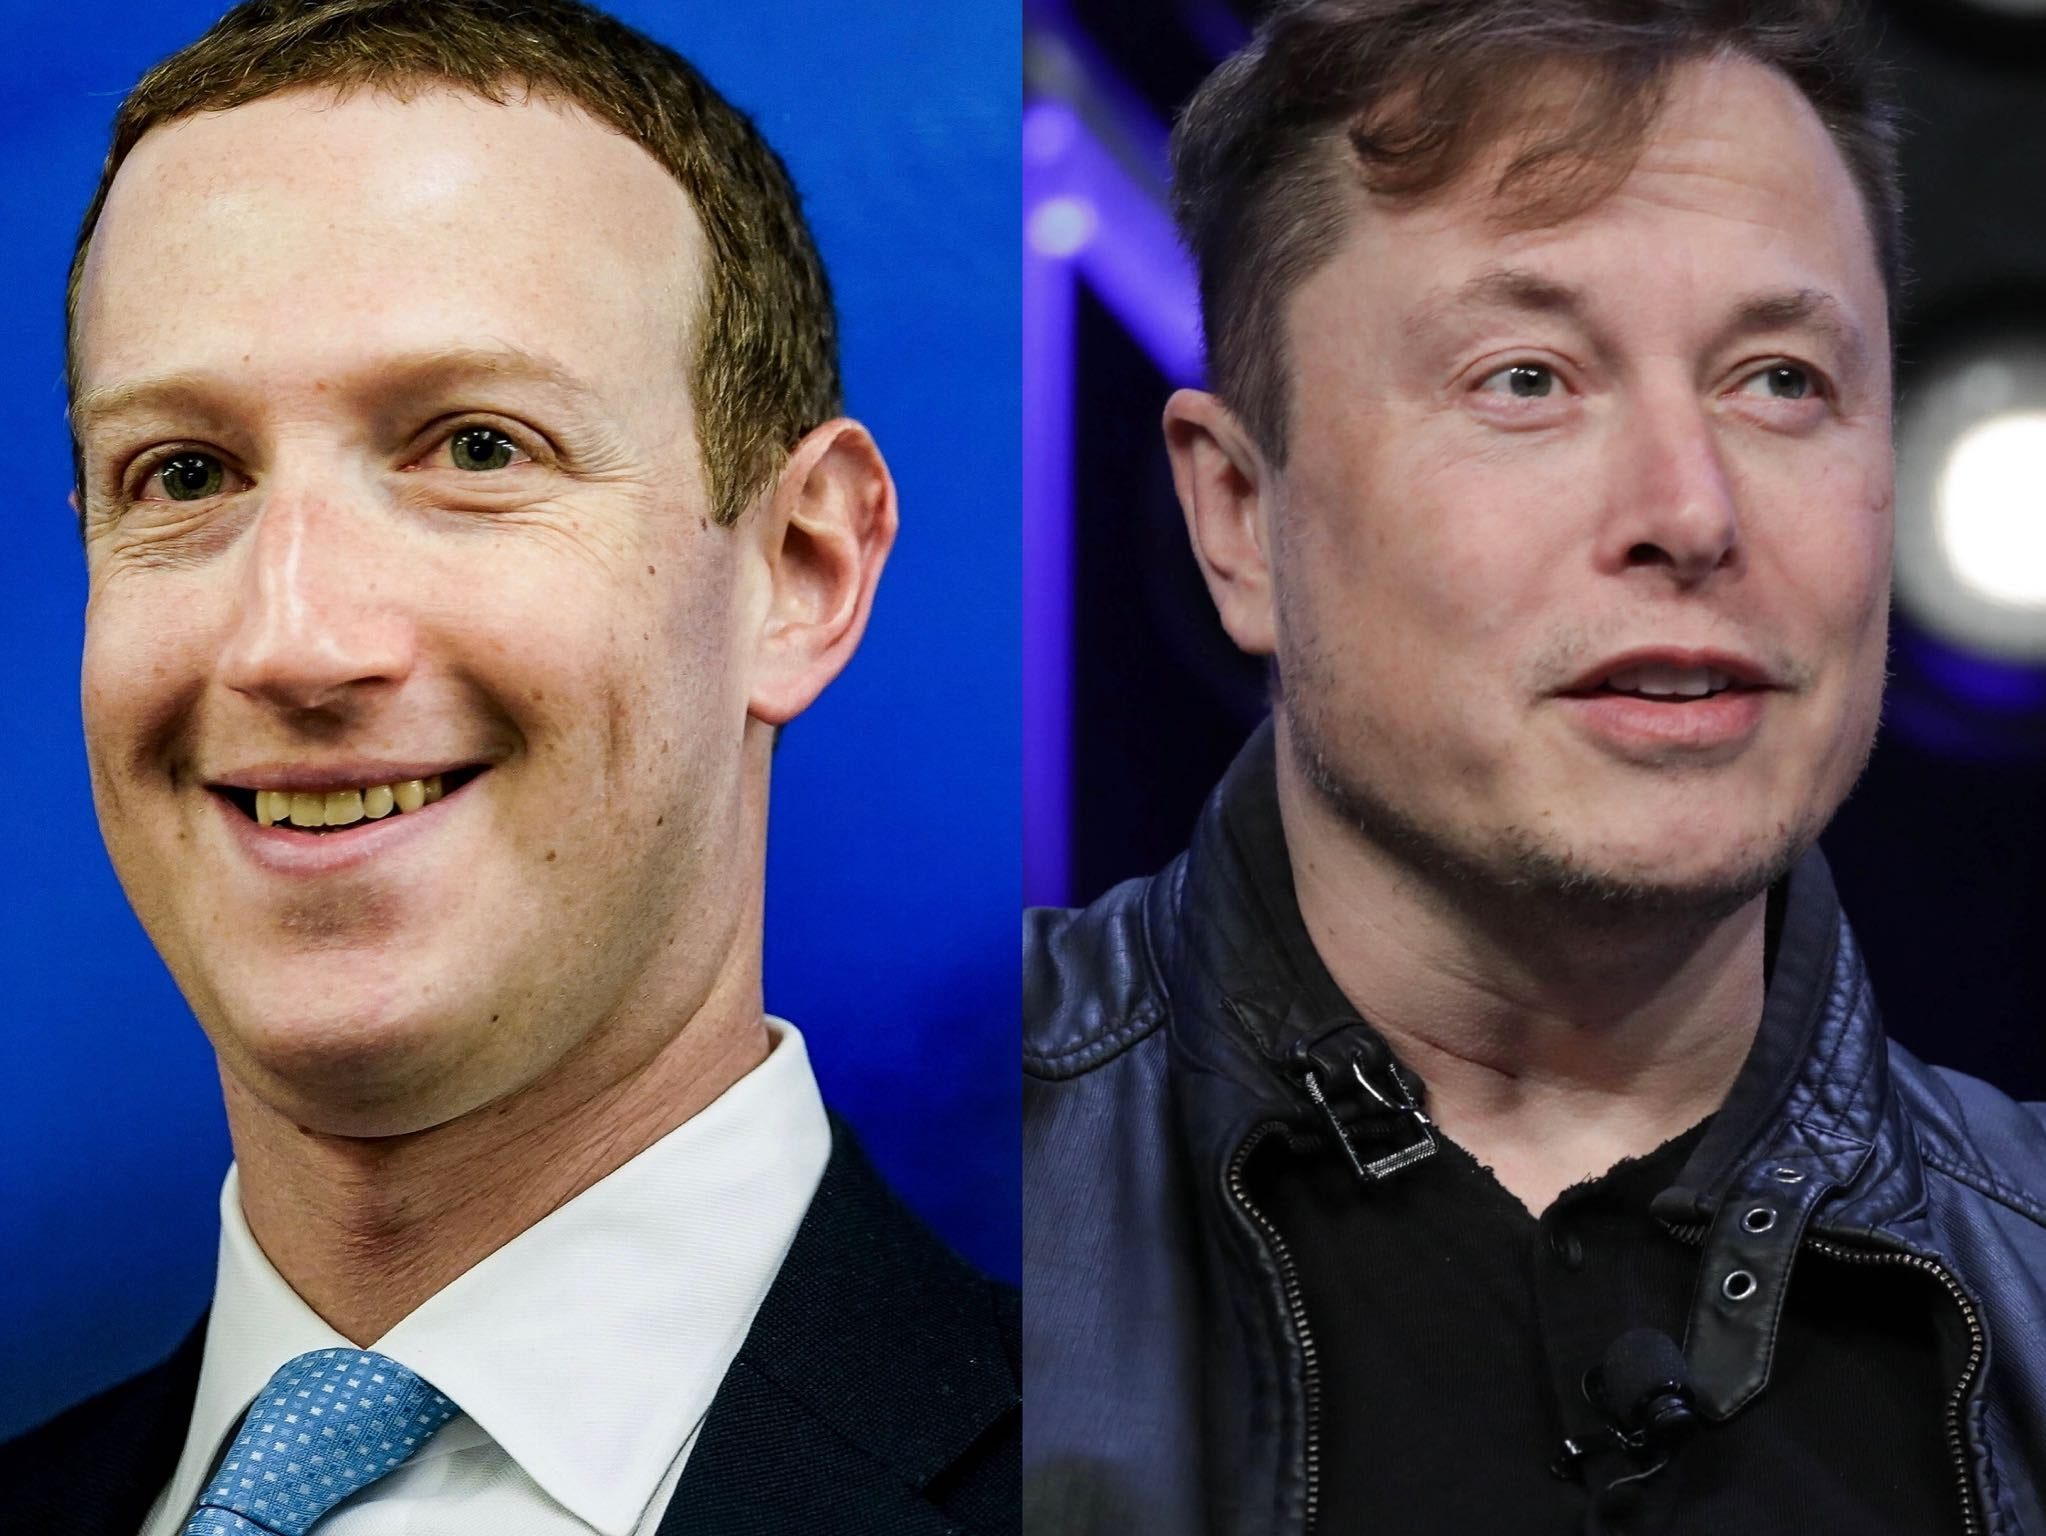 Why Elon Musk And Mark Zuckerberg Disagree On Coronavirus Re Opening Observer